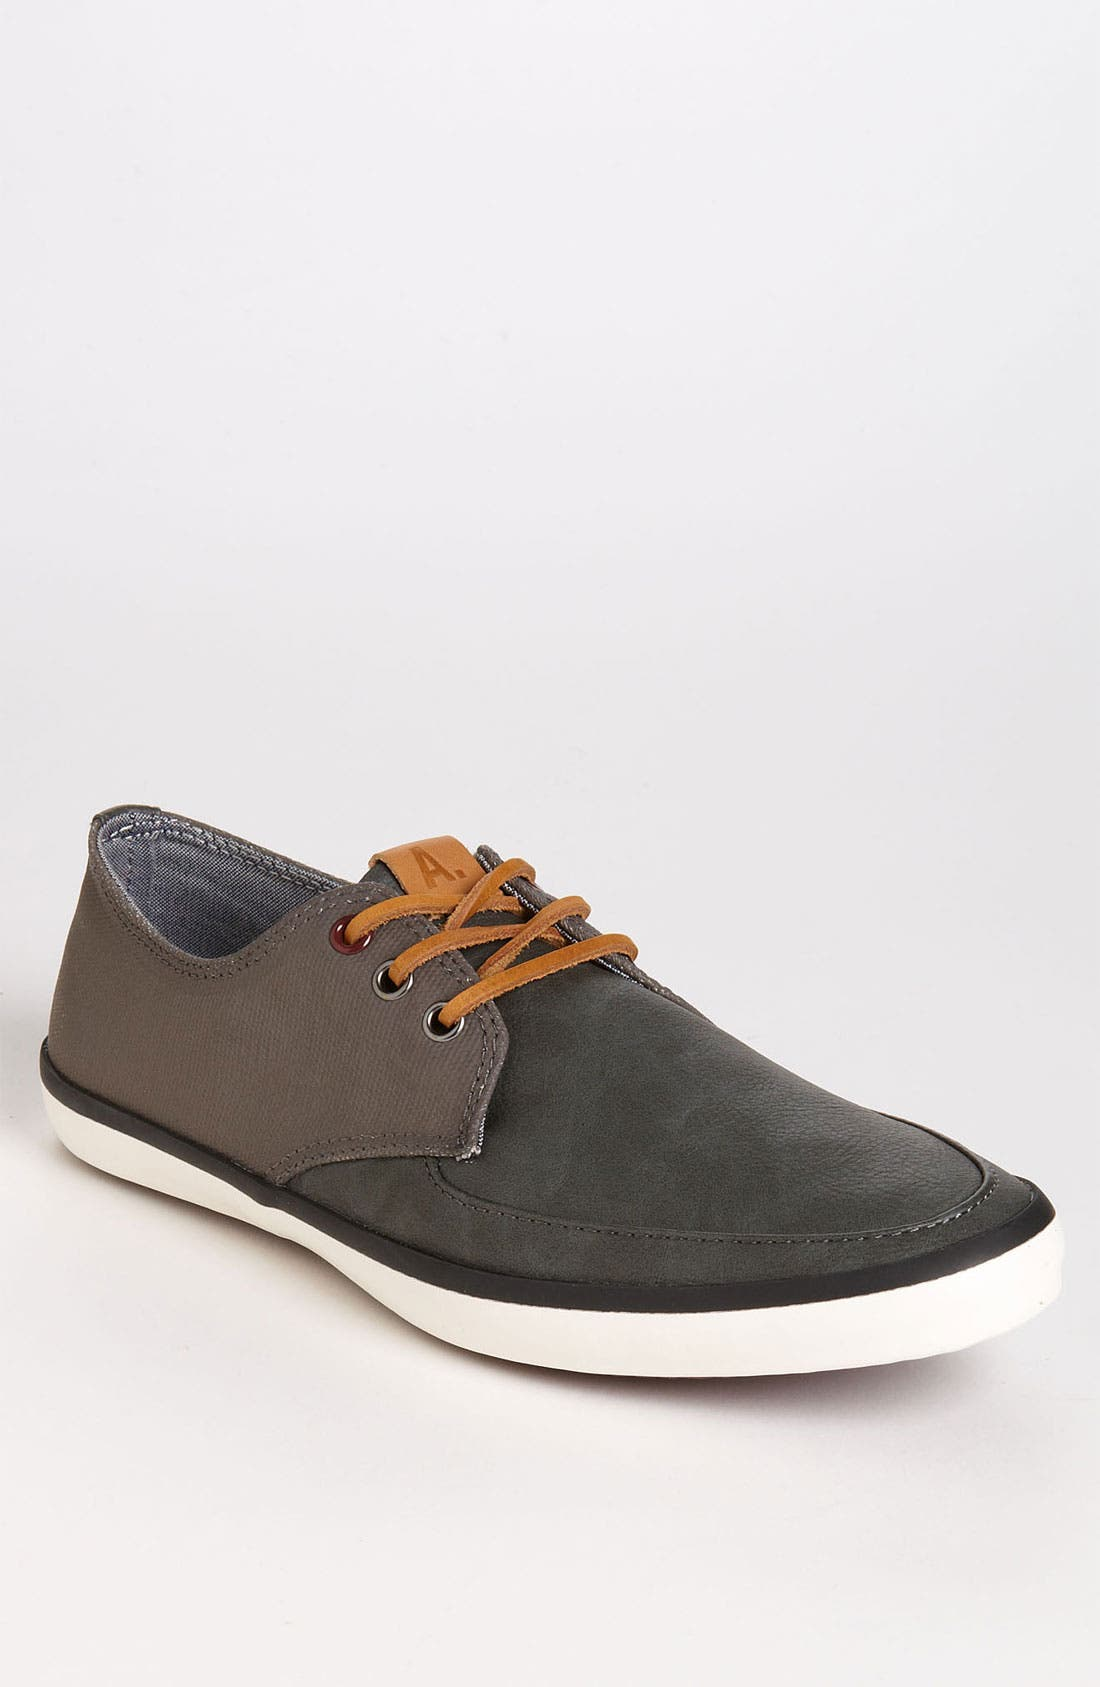 Alternate Image 1 Selected - ALDO 'Jaremka' Sneaker